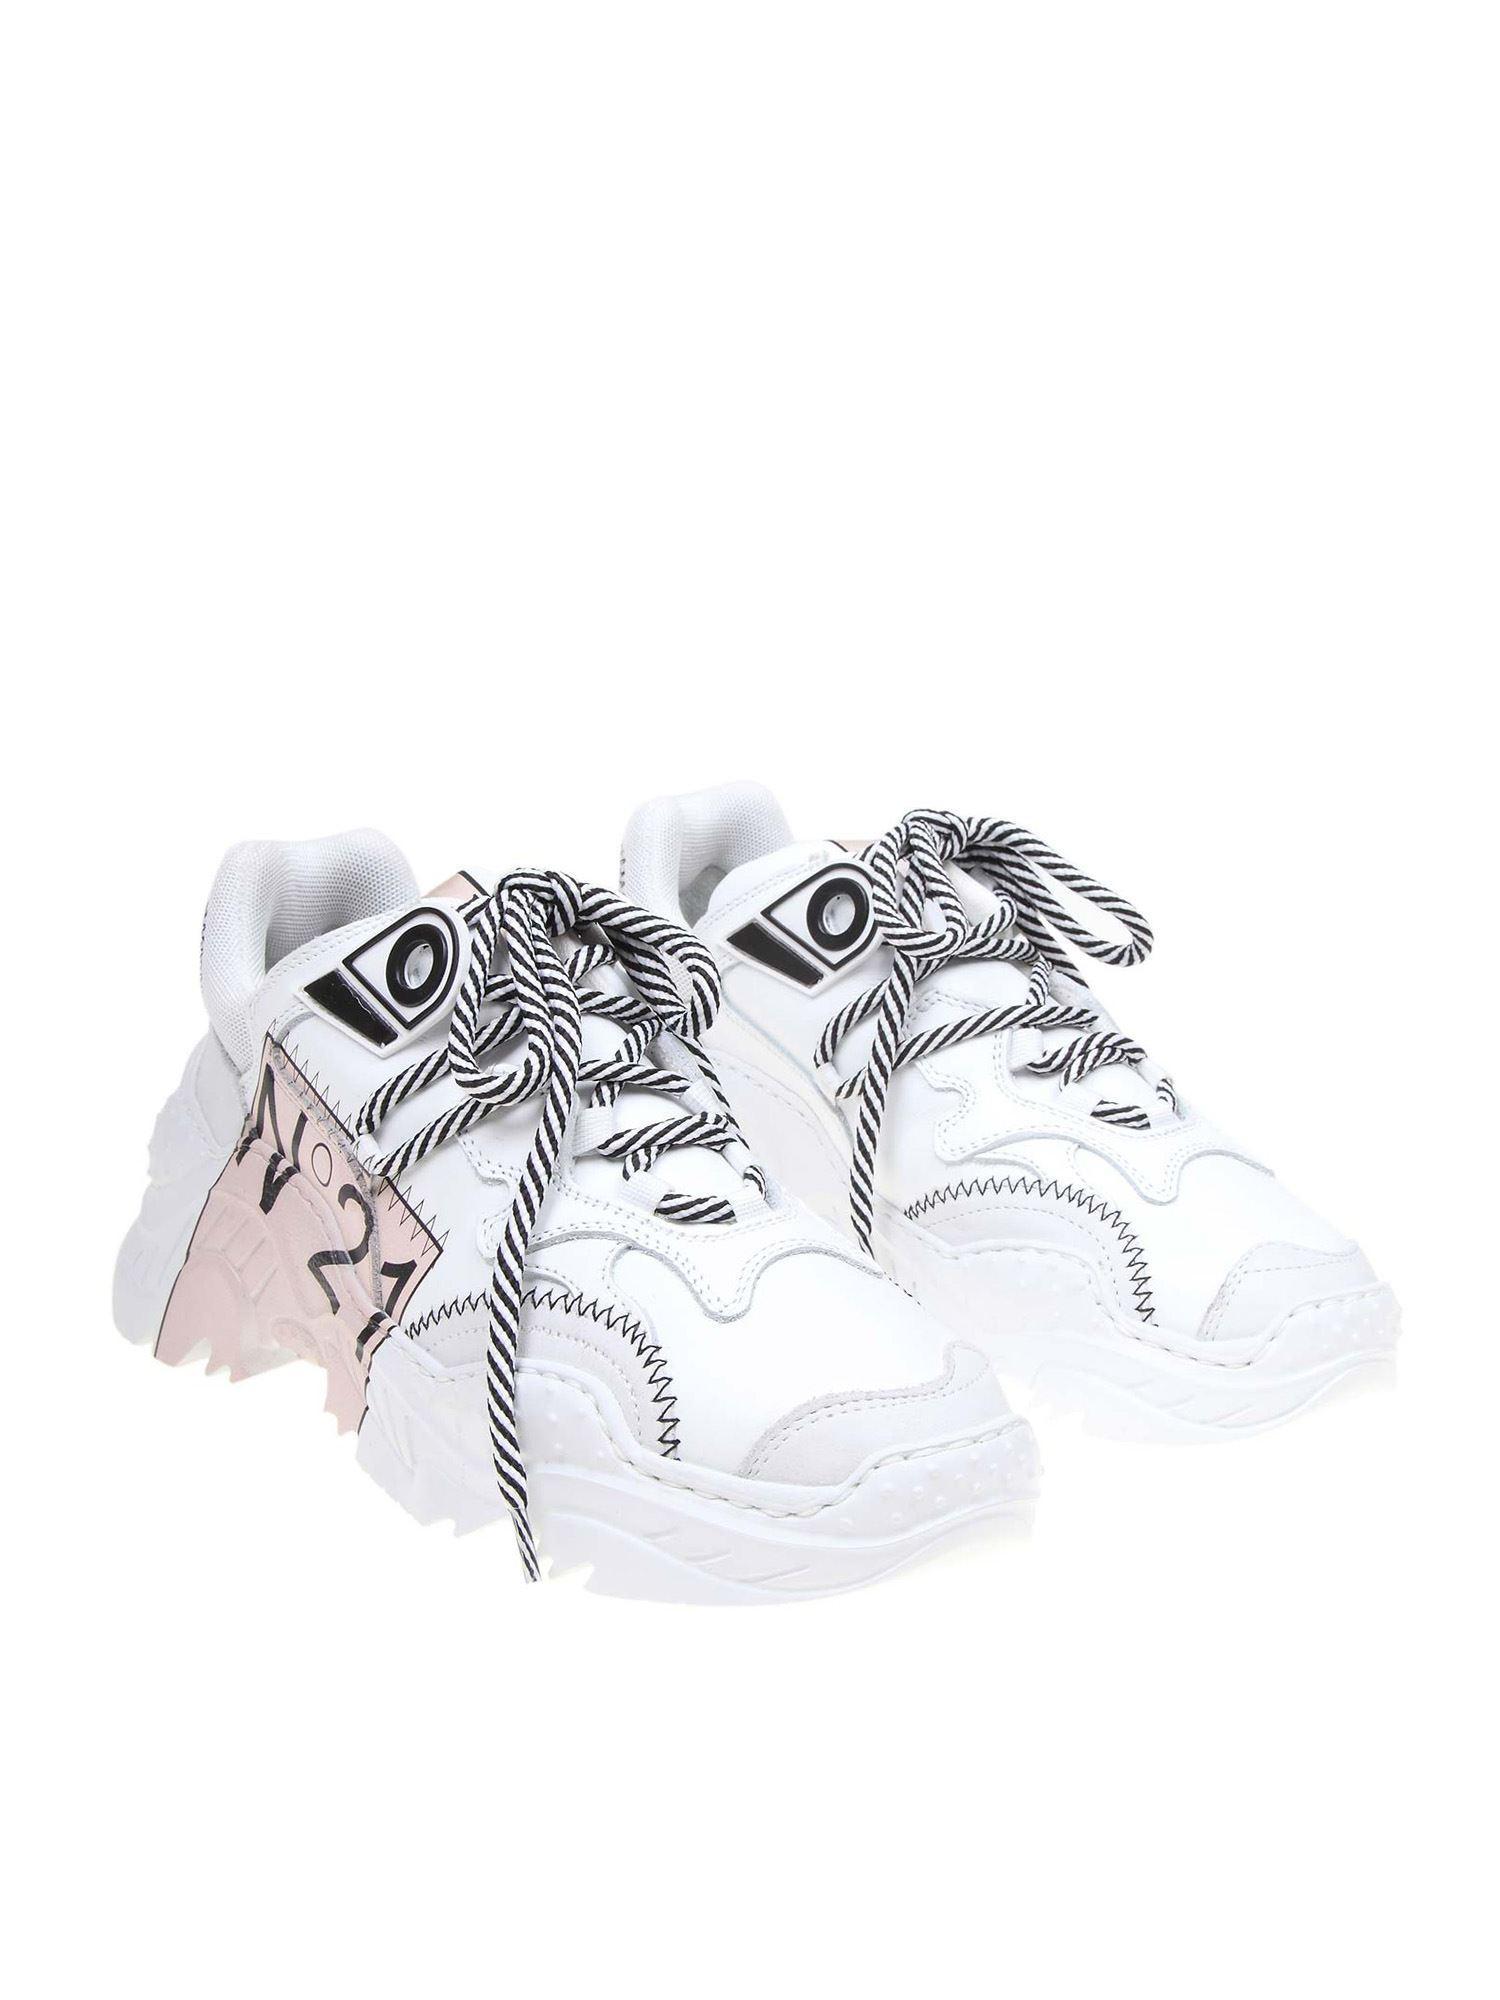 preschool adidas Tubular Doom Sock PK Adidas Originals Womens Trainers & Sportswear Atterley